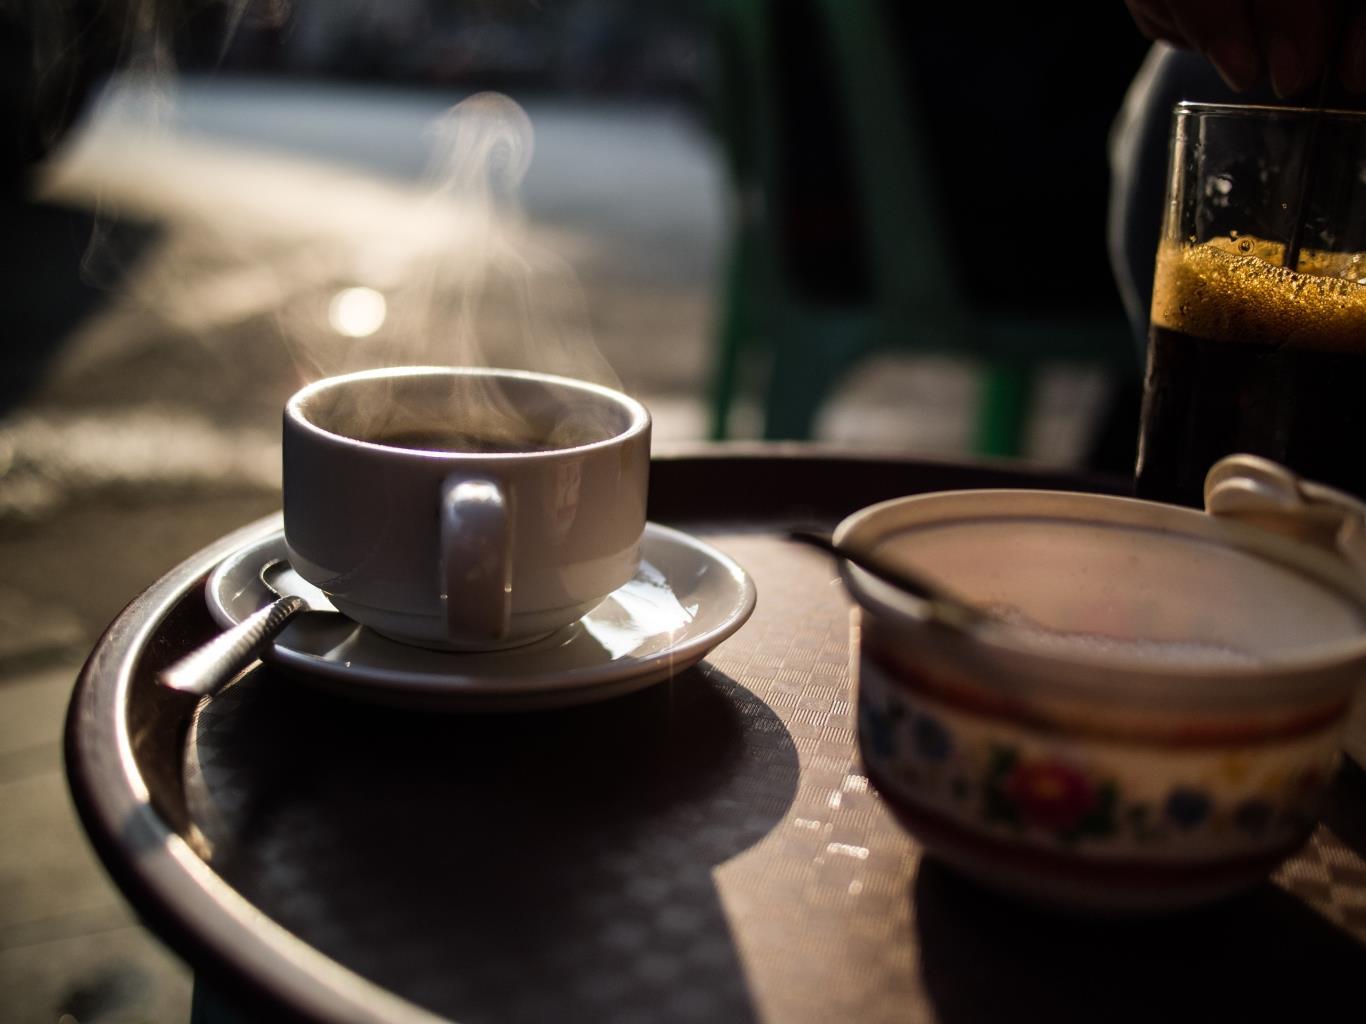 NguyenBinhVTV-162901102952-vietnam-weasel-coffee1